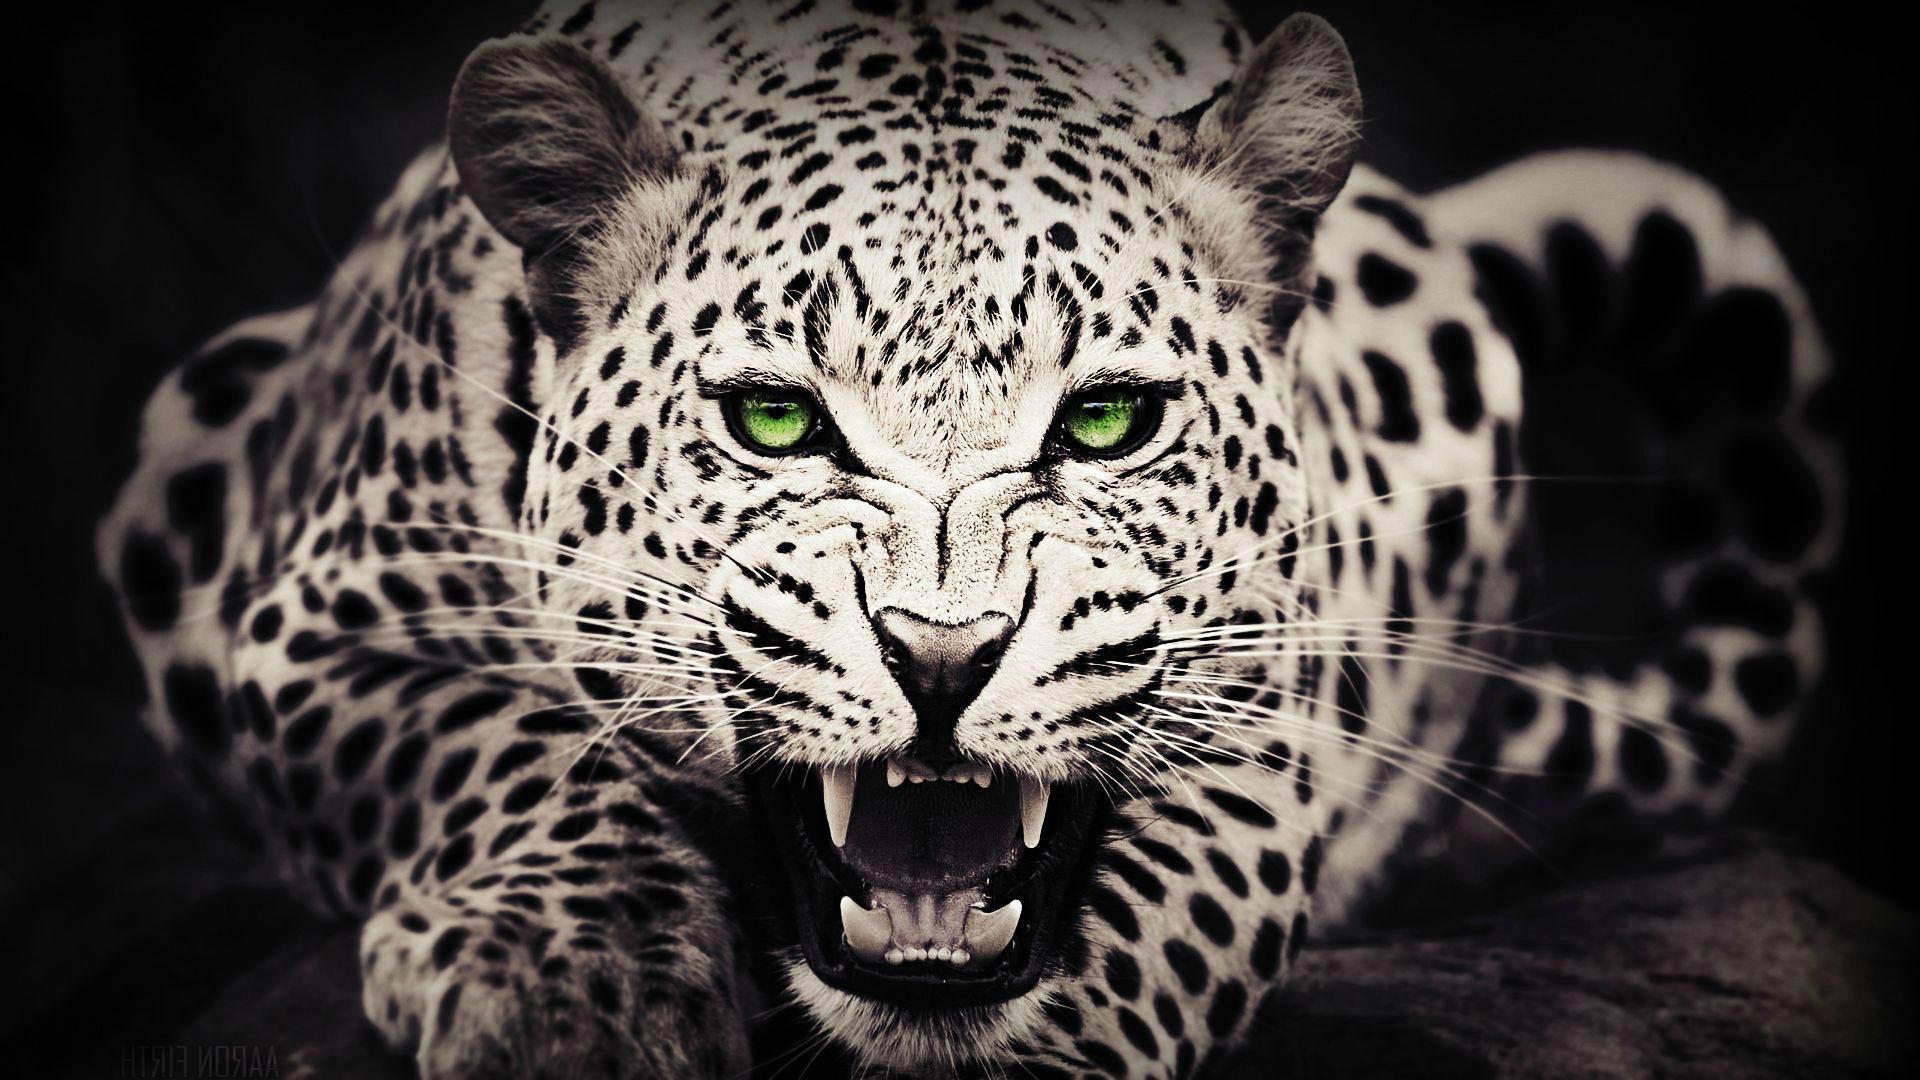 Res: 1920x1080, Cheetah Wallpapers 23 - 1920 X 1080